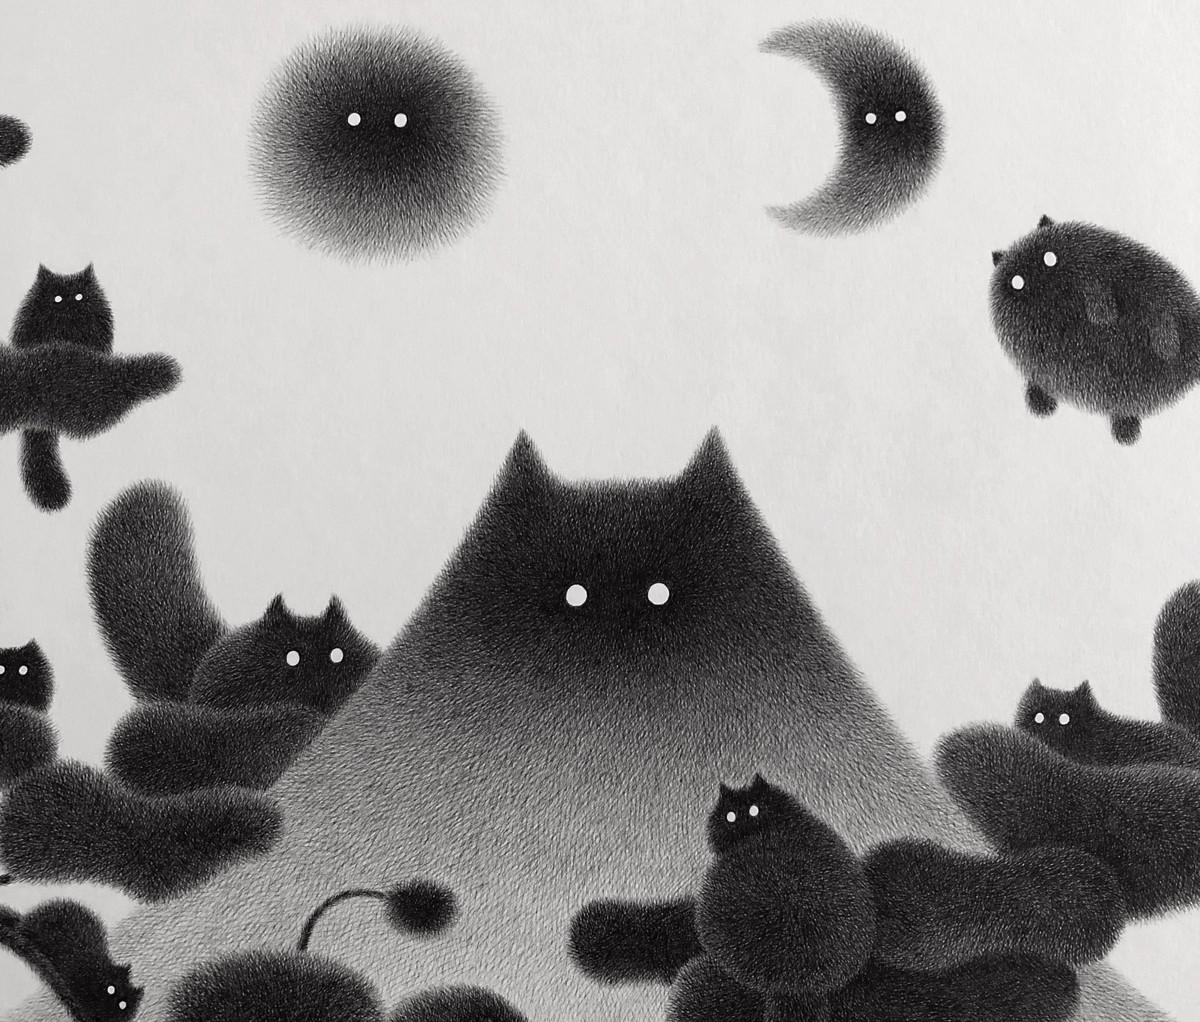 Furry Utopia on Kamwei Fong's illustration